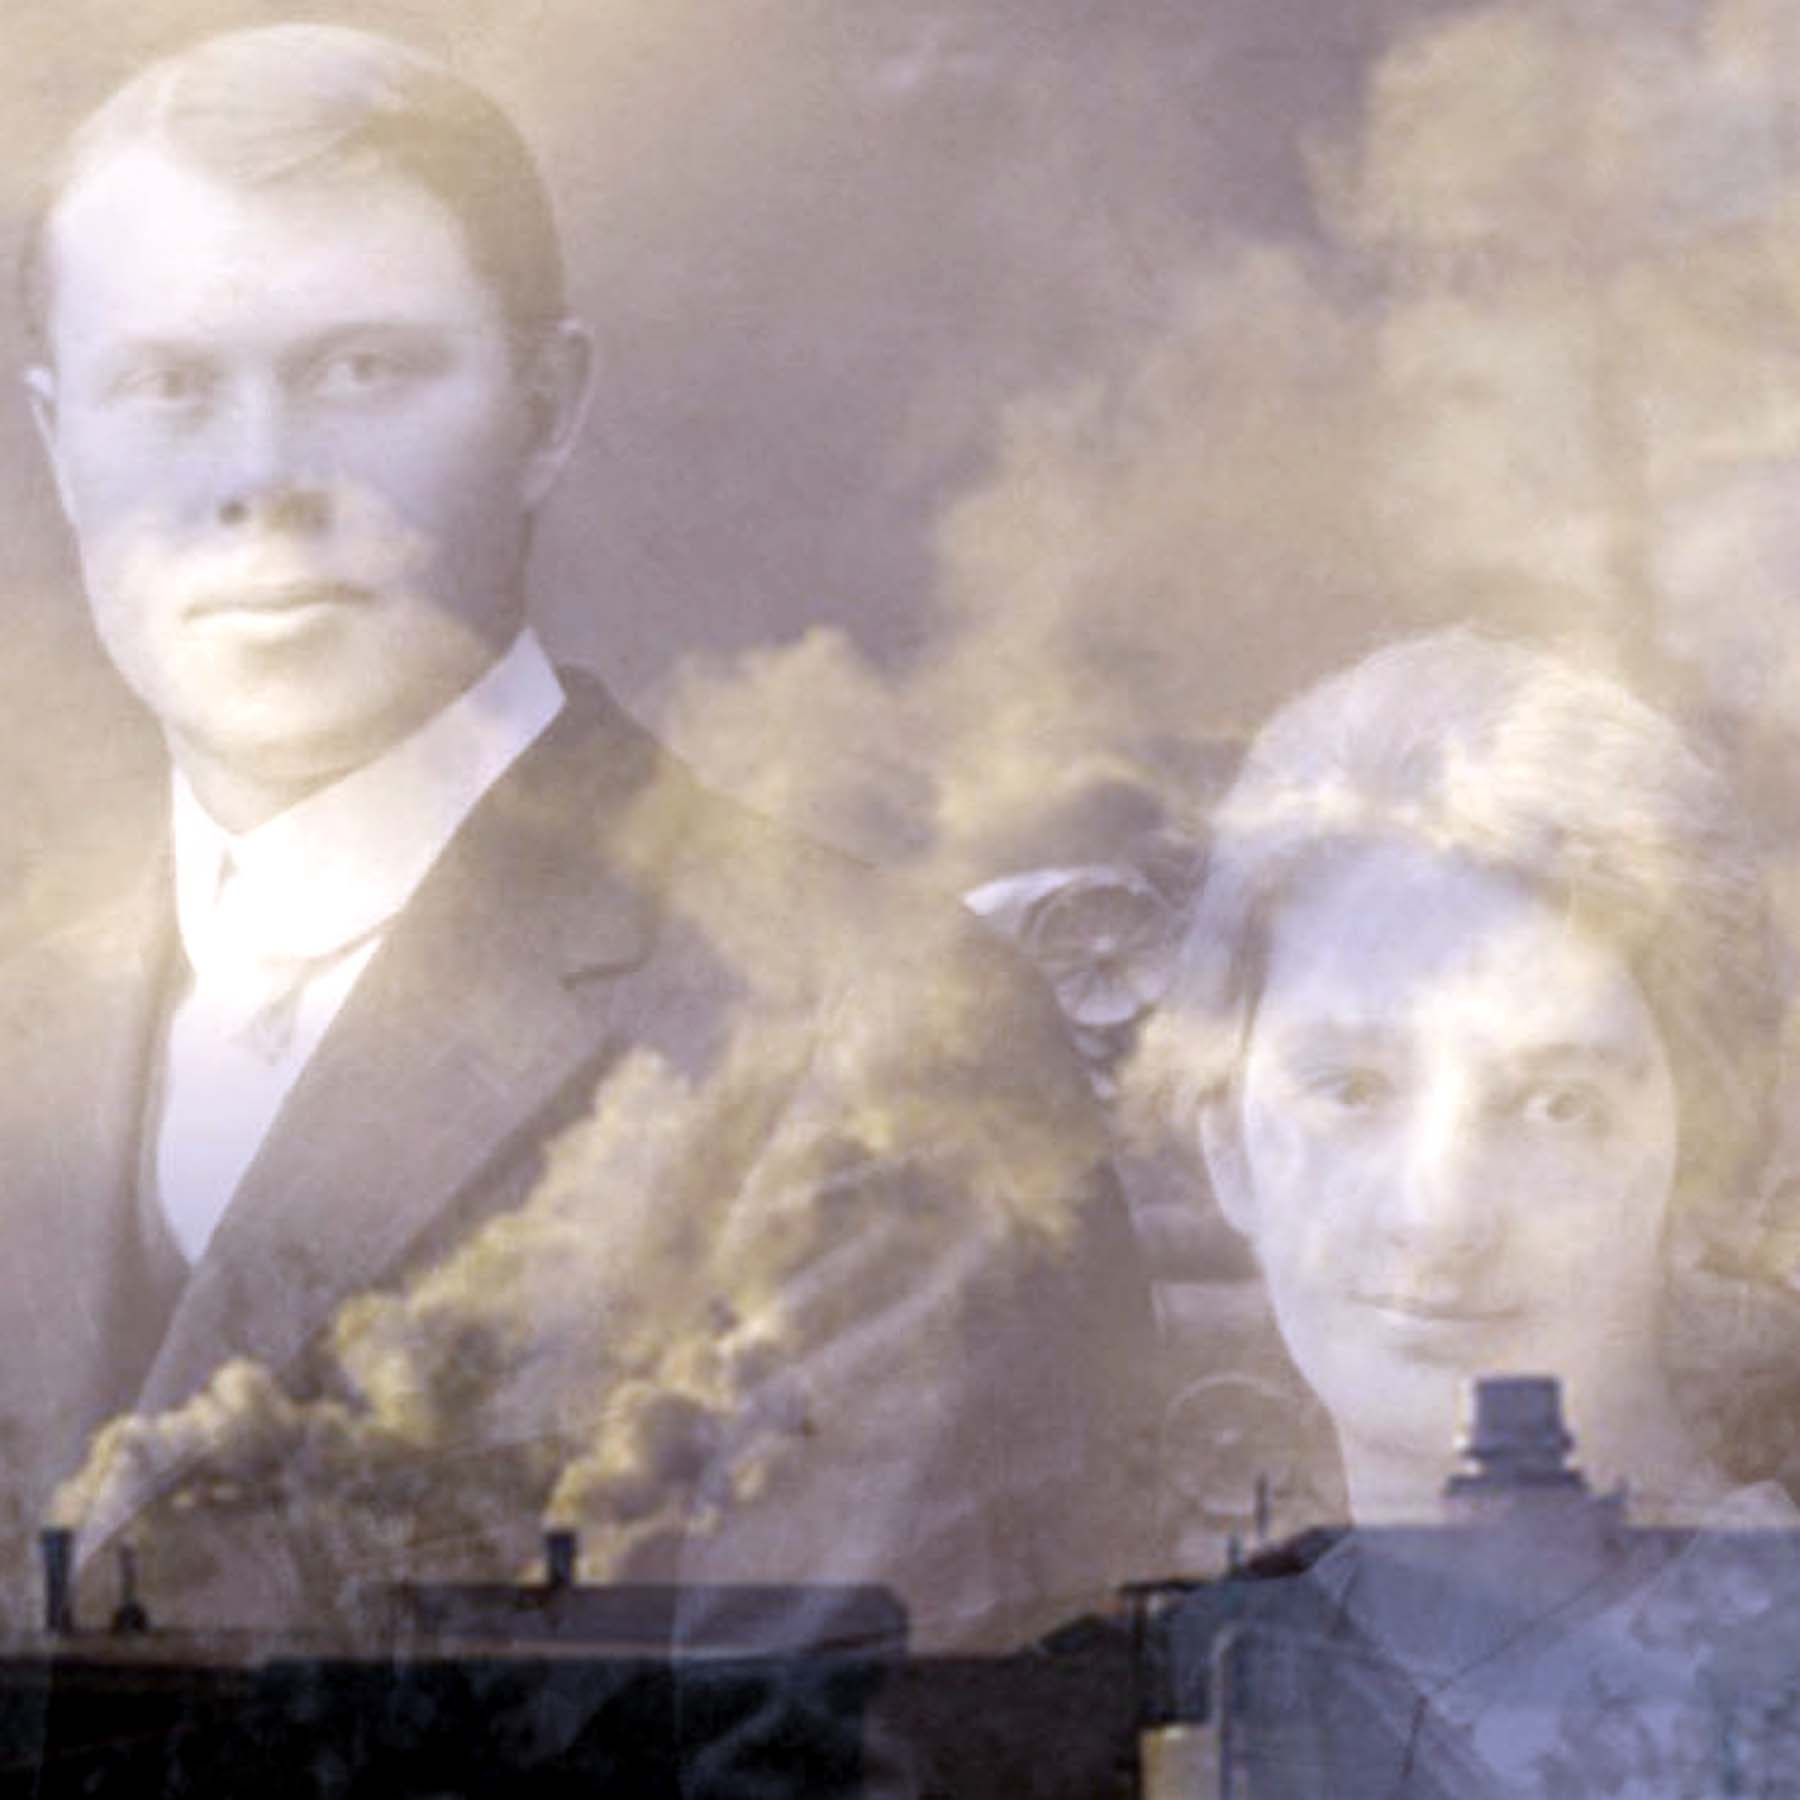 StephenMead-From Farmers to Smokestacks